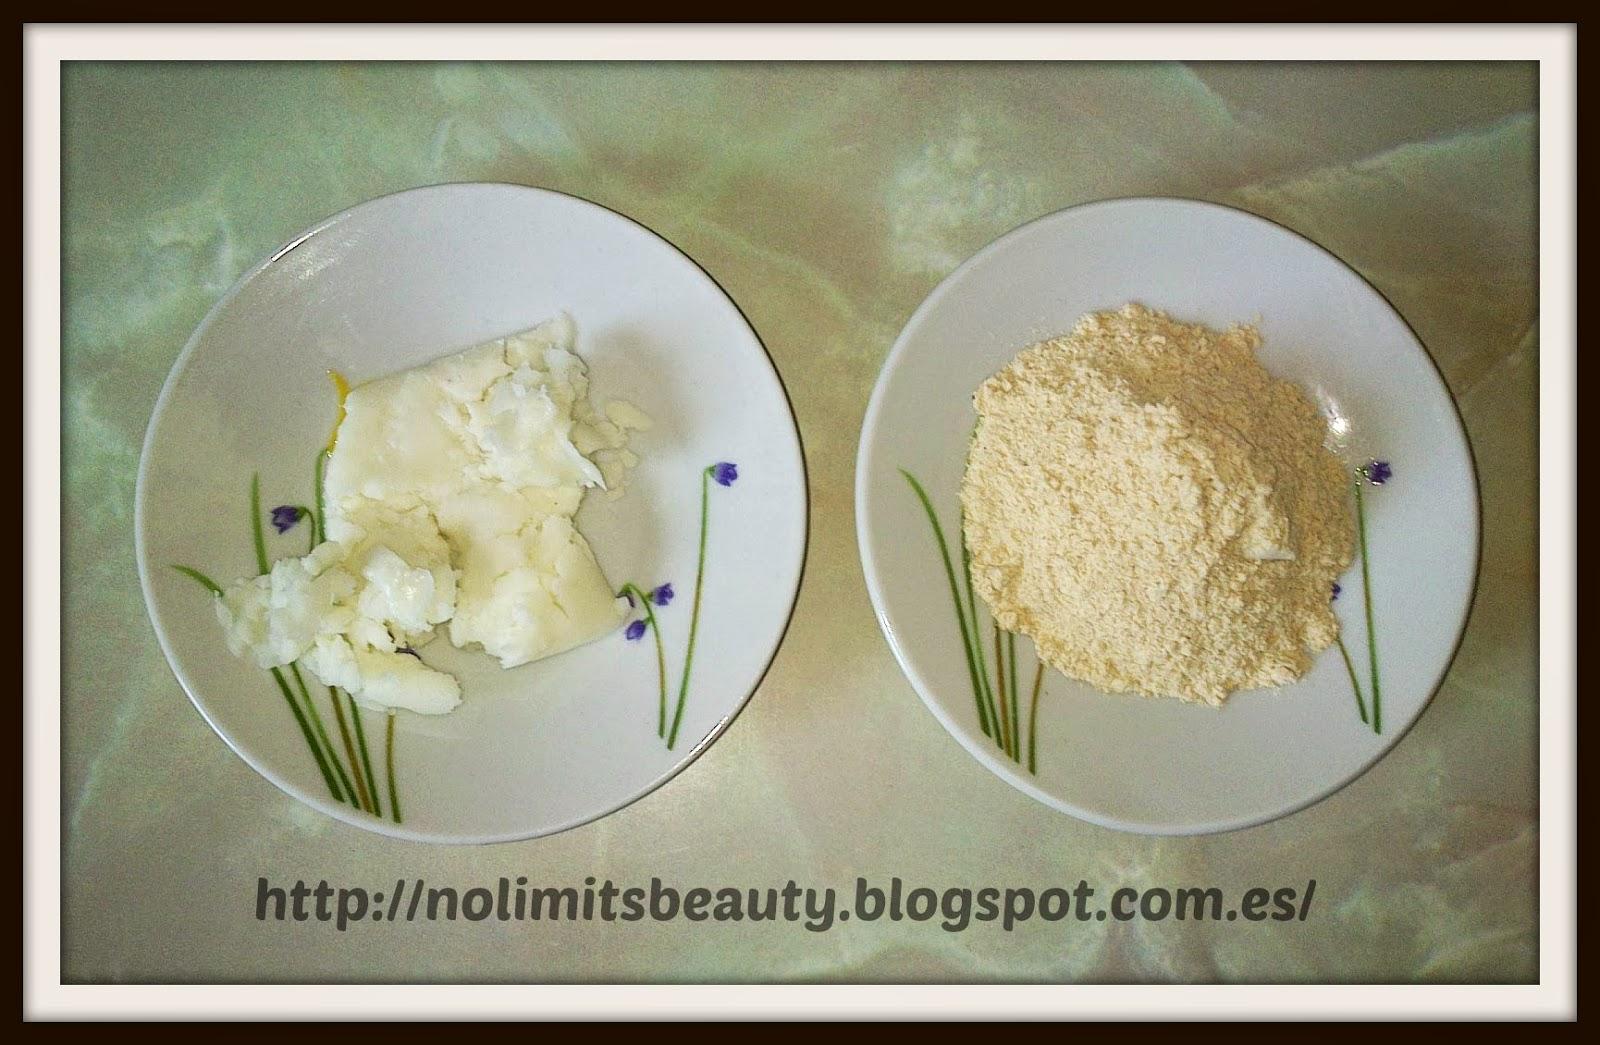 Artisana, Organics, Raw Coconut Butter (a la izquierda)